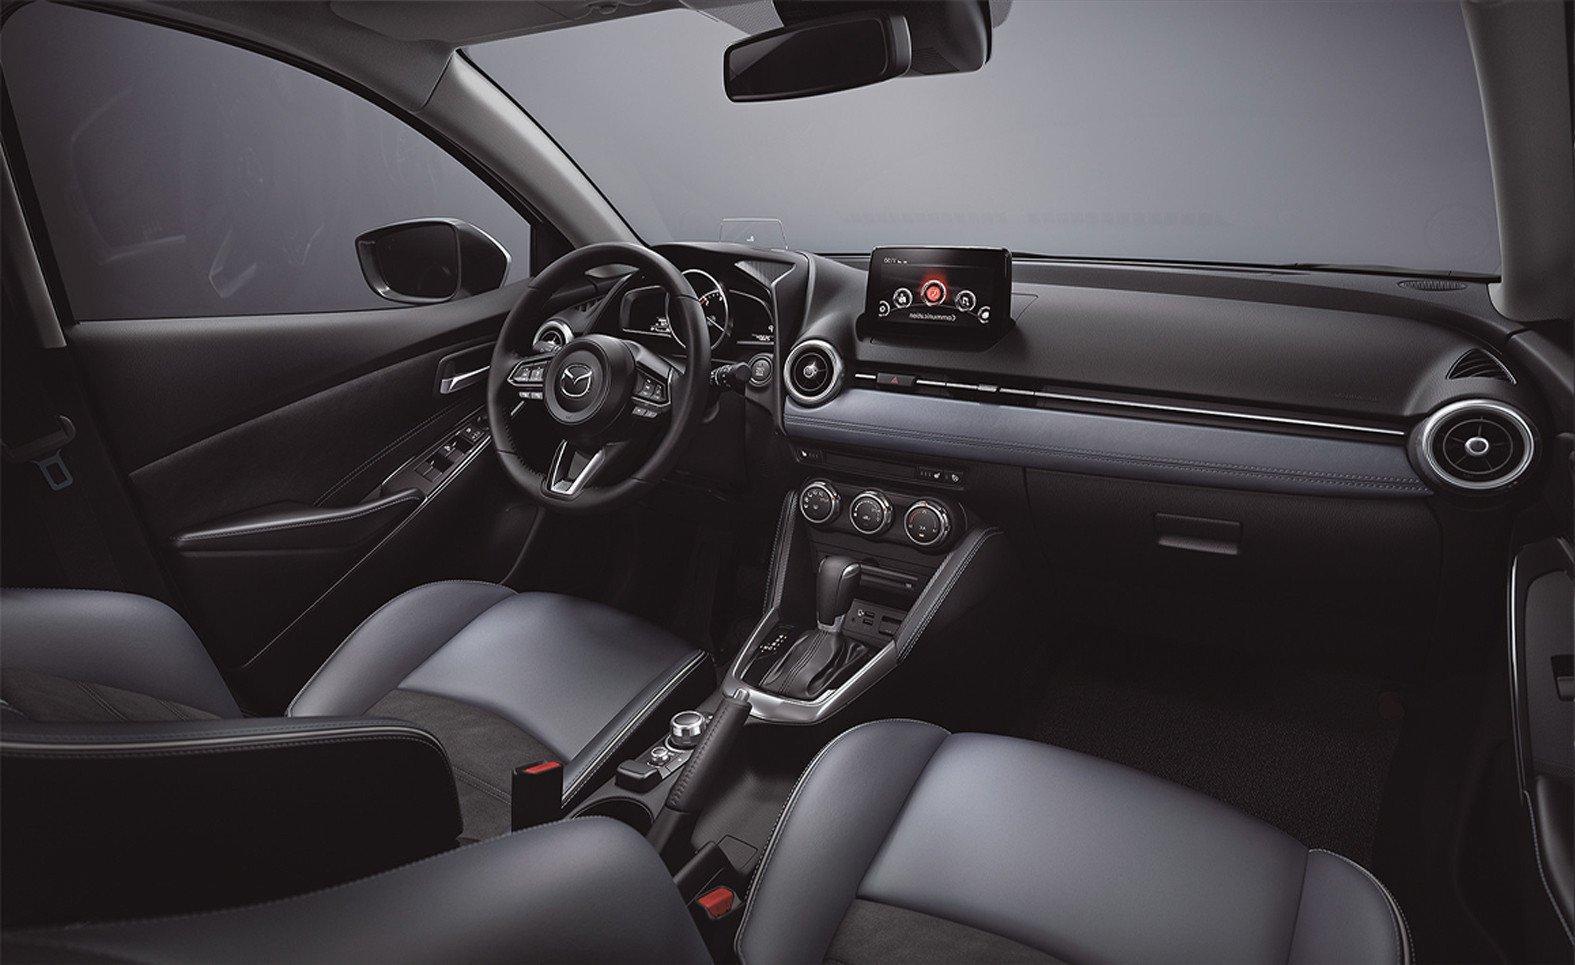 Suzuki Swift Boosterjet AT 2020 Mazda 2 Hatchback i Grand Touring 2020 comparativa